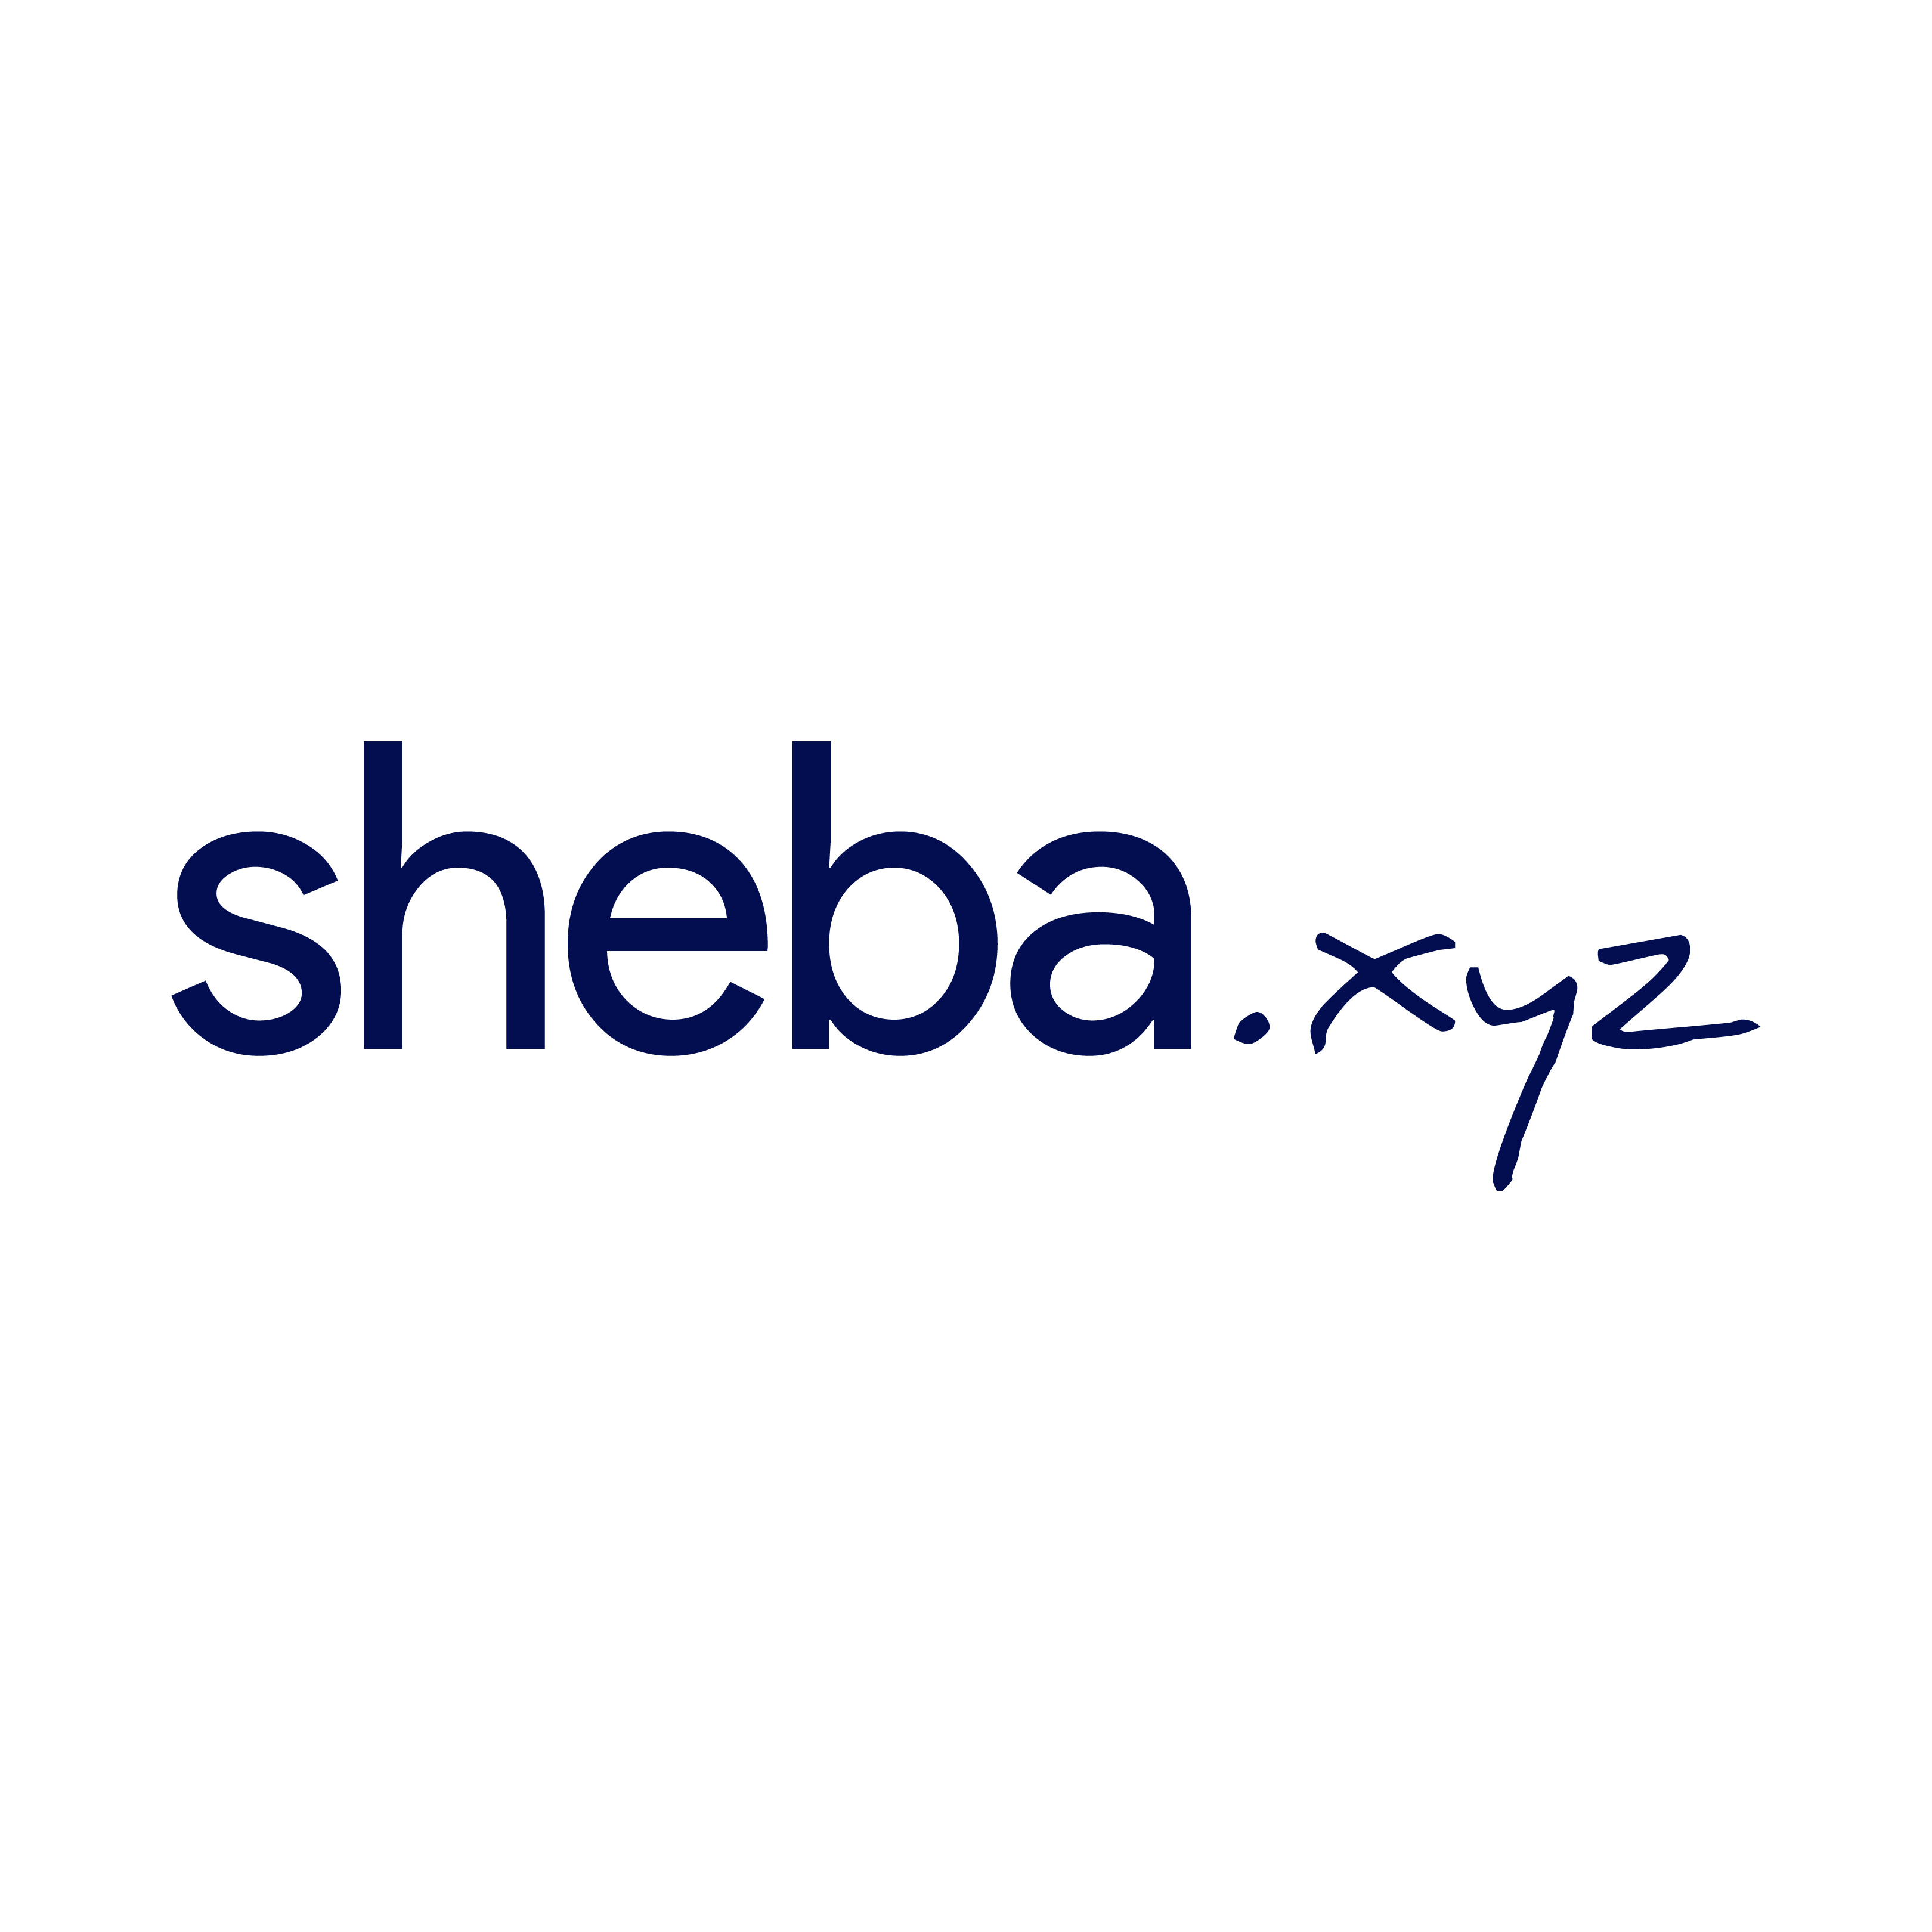 https://assets.roar.media/assets/3VT222rIXBuFHFBP_Logo.png